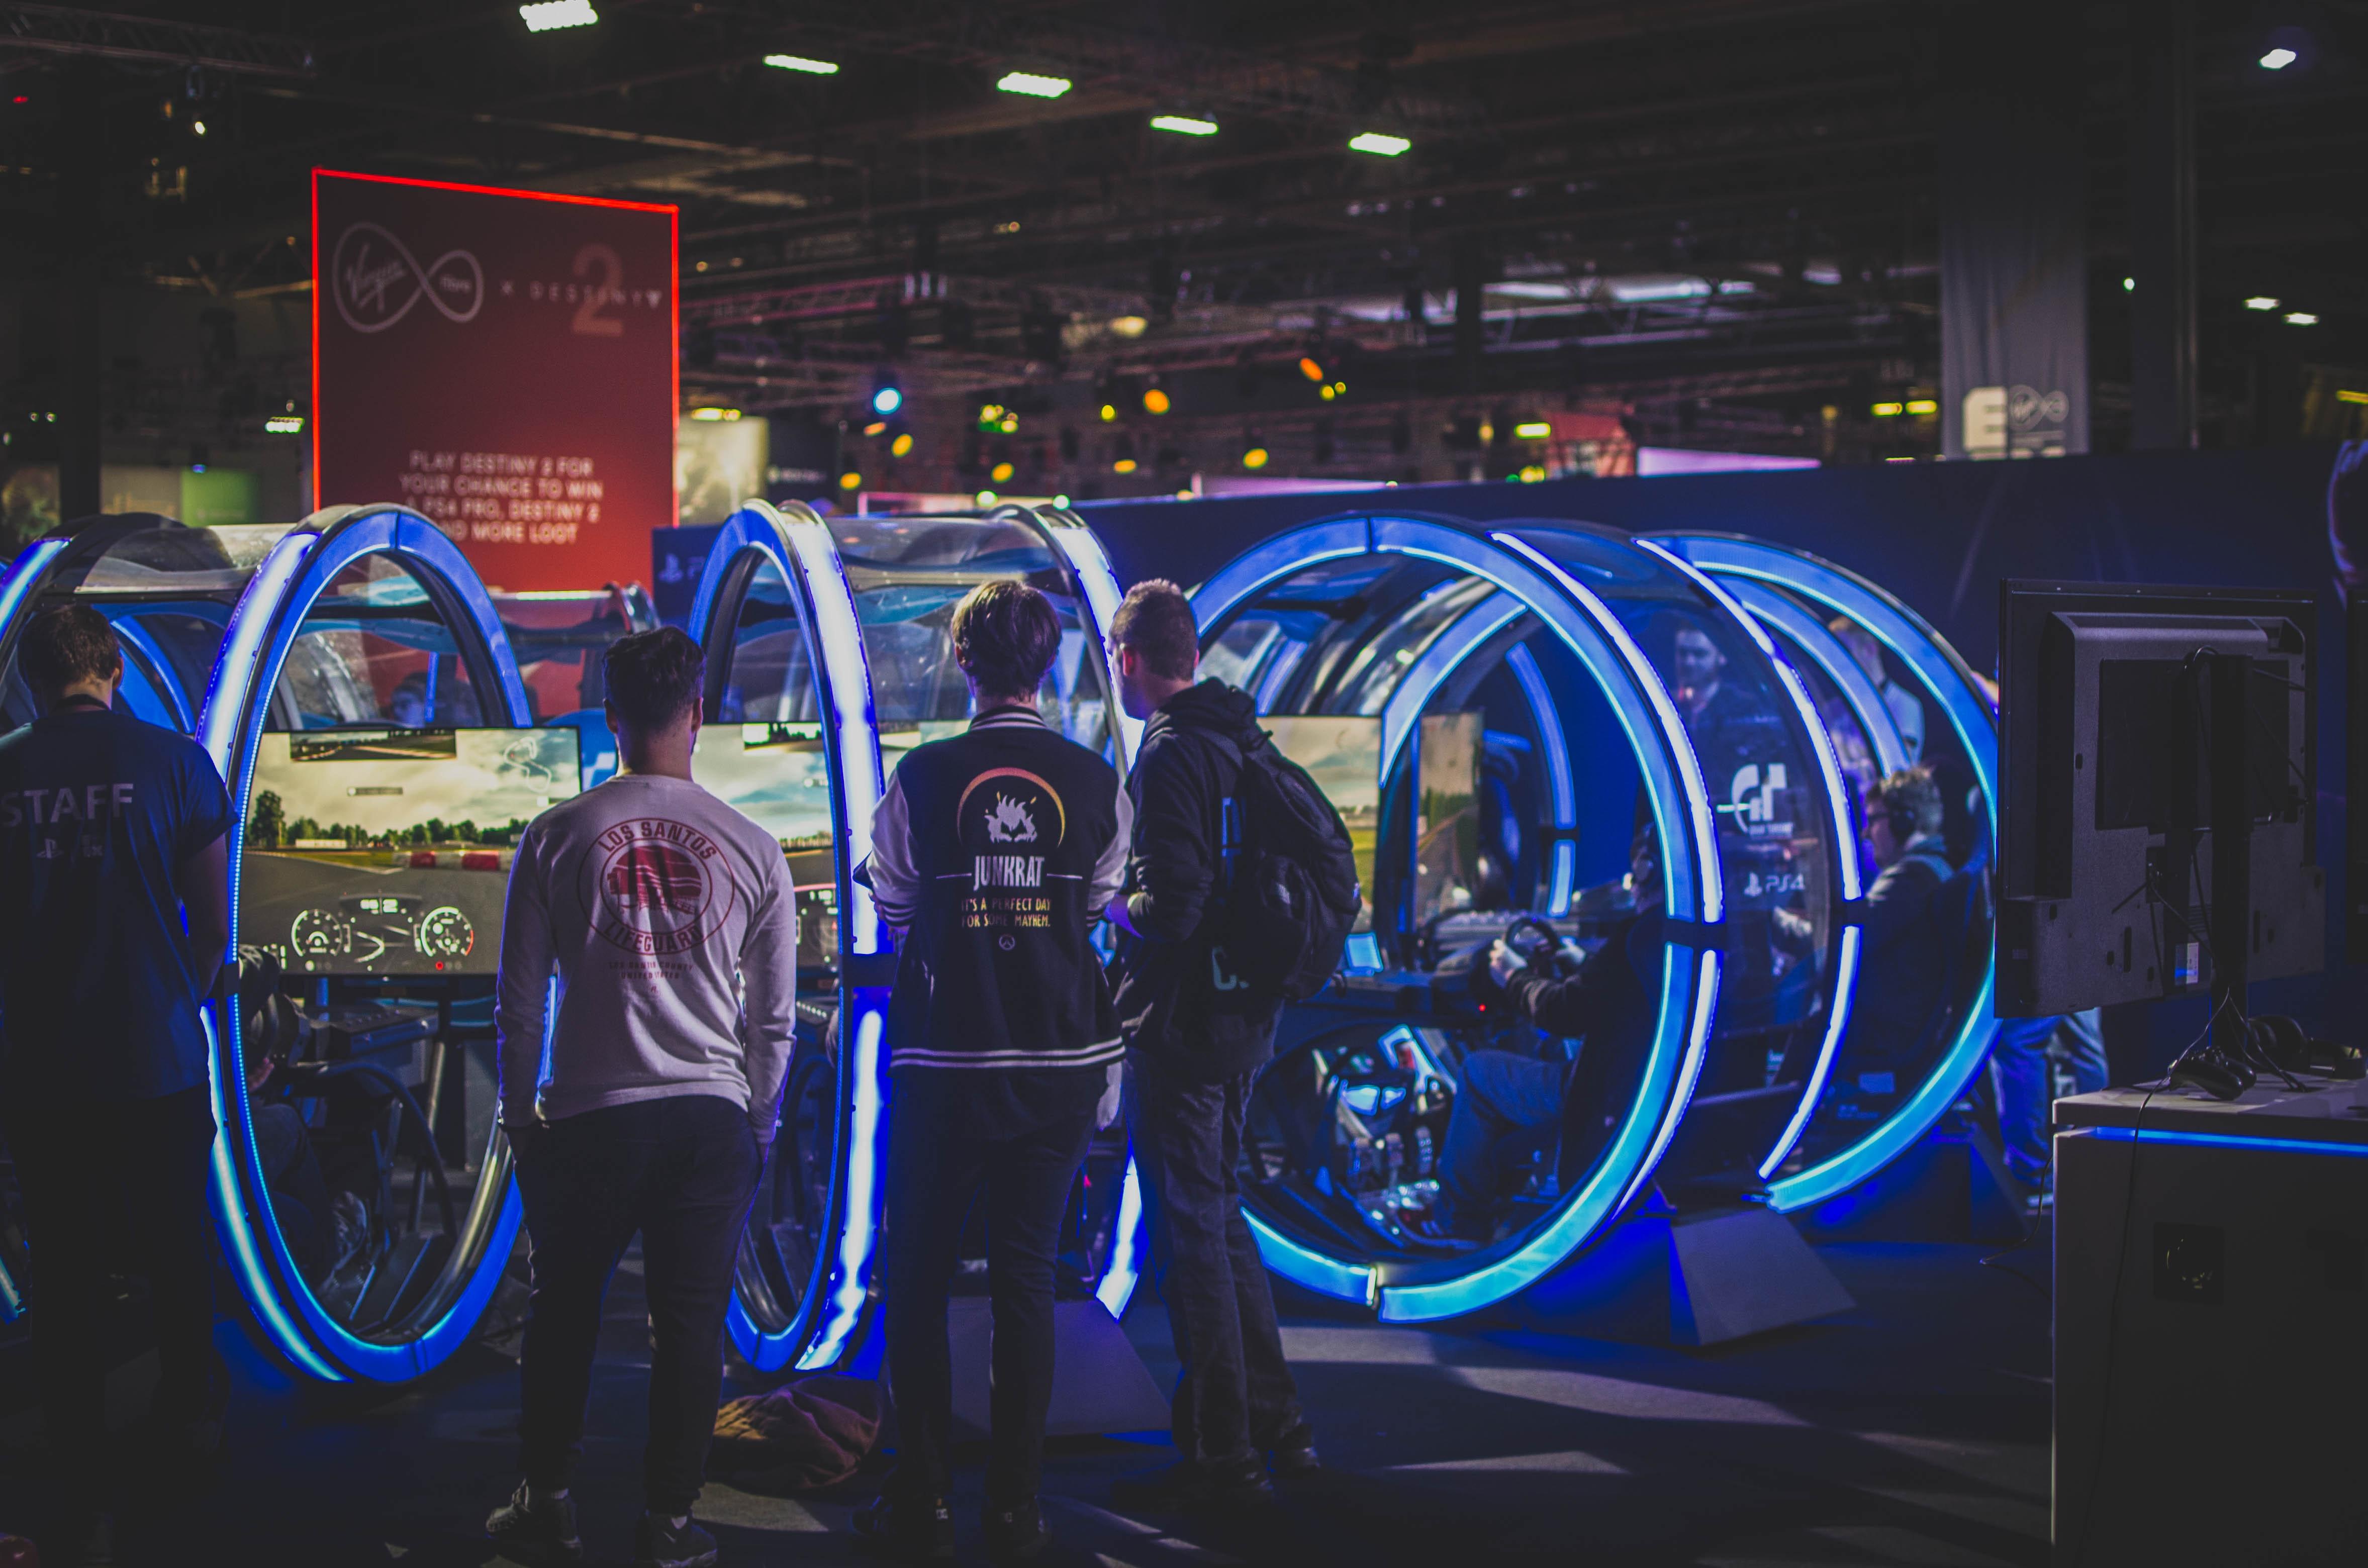 Three men standing in front of racing arcade machines photo